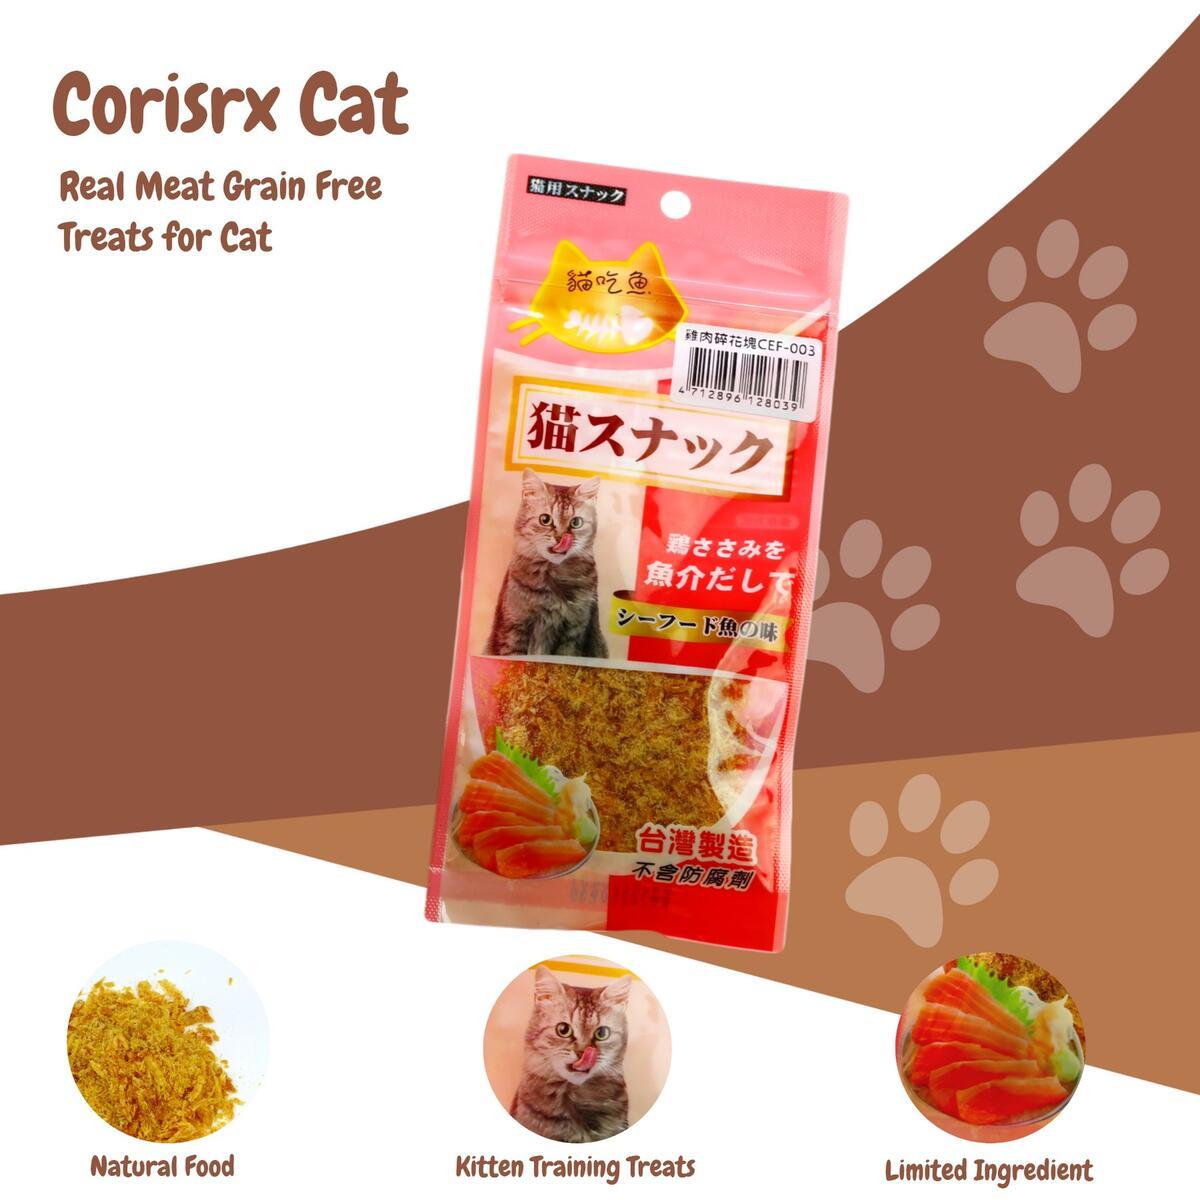 Real Meat Grain Free Cat Treats - Salmon Chicken Crumbs